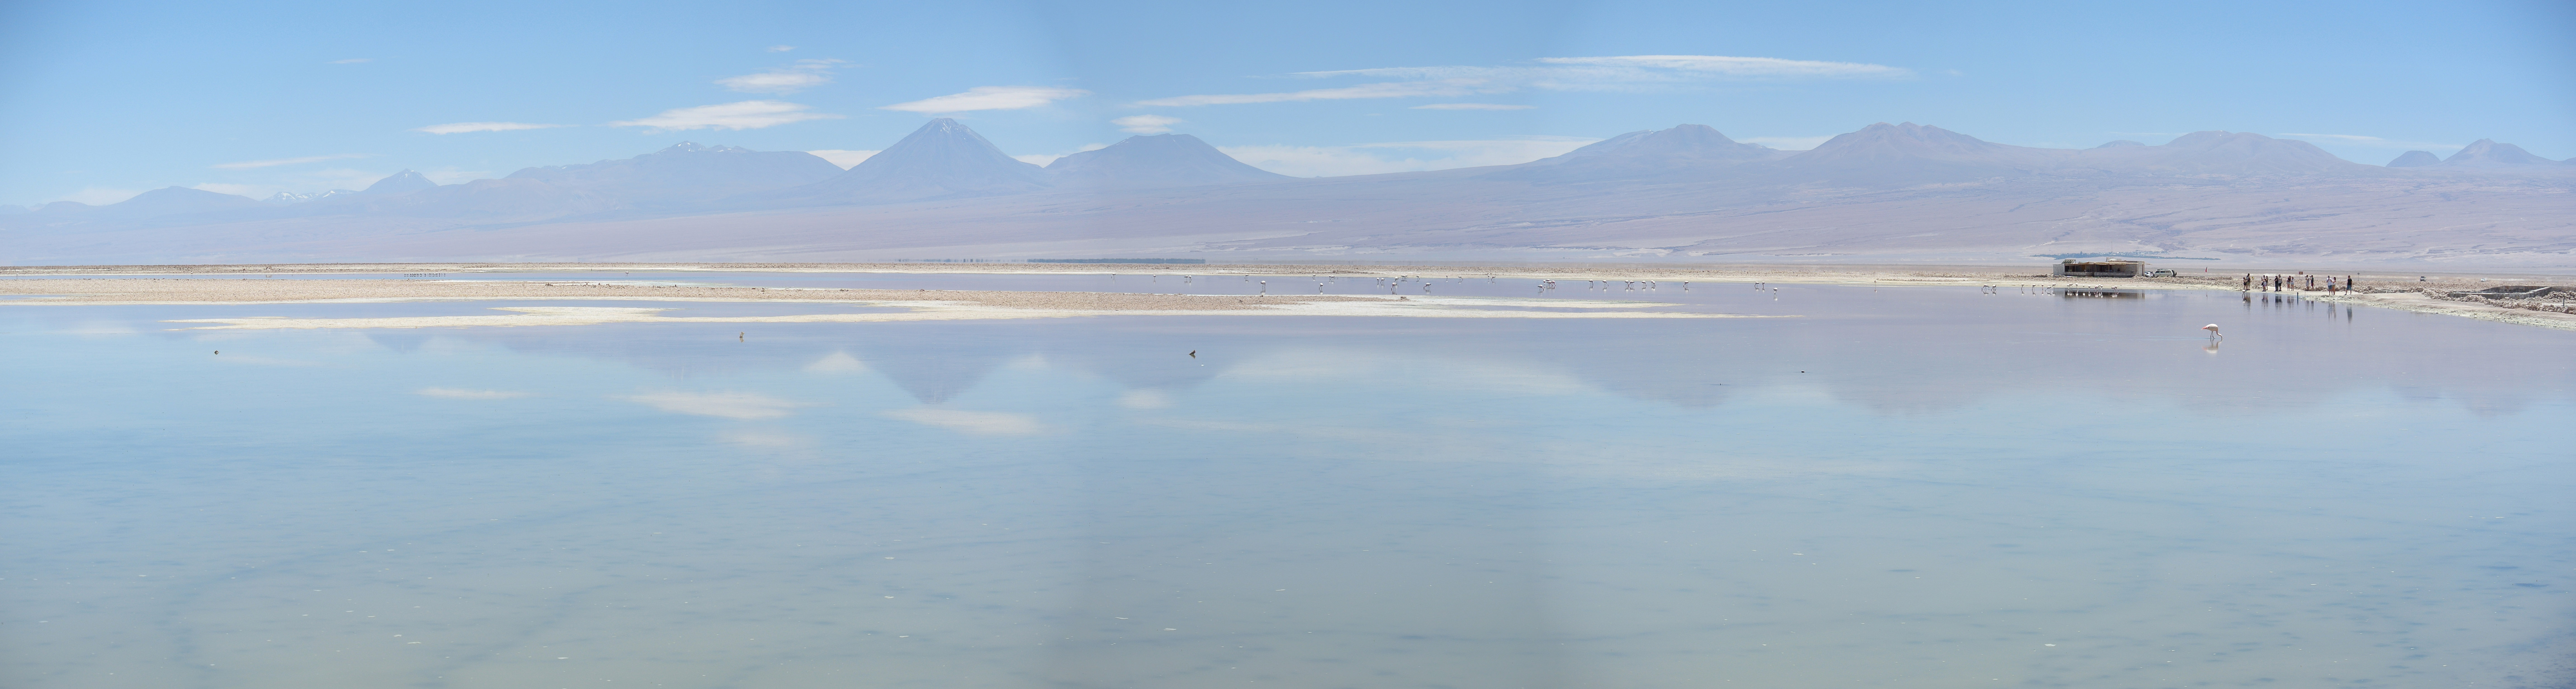 017 0912 Mirador - Salar de Atacama 89jpg